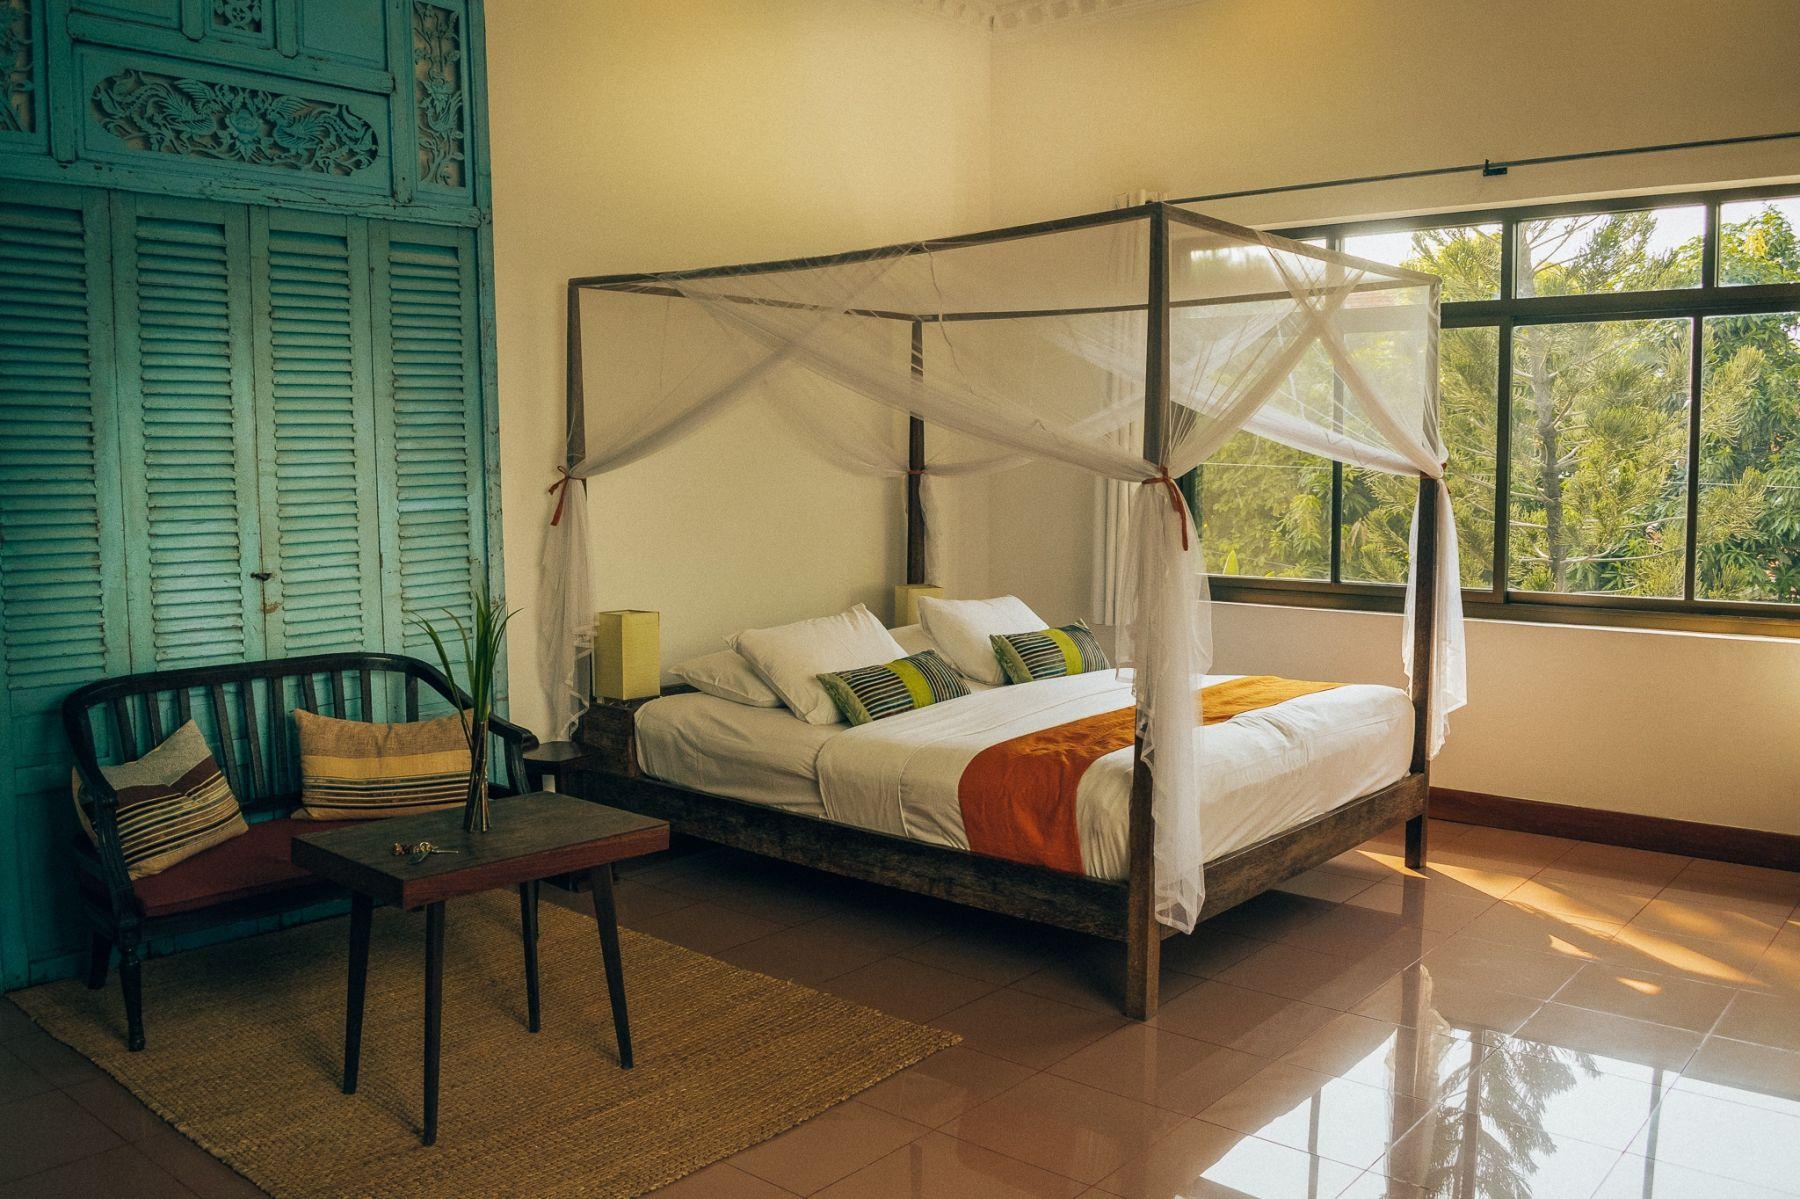 Image of Pavilion Hotel